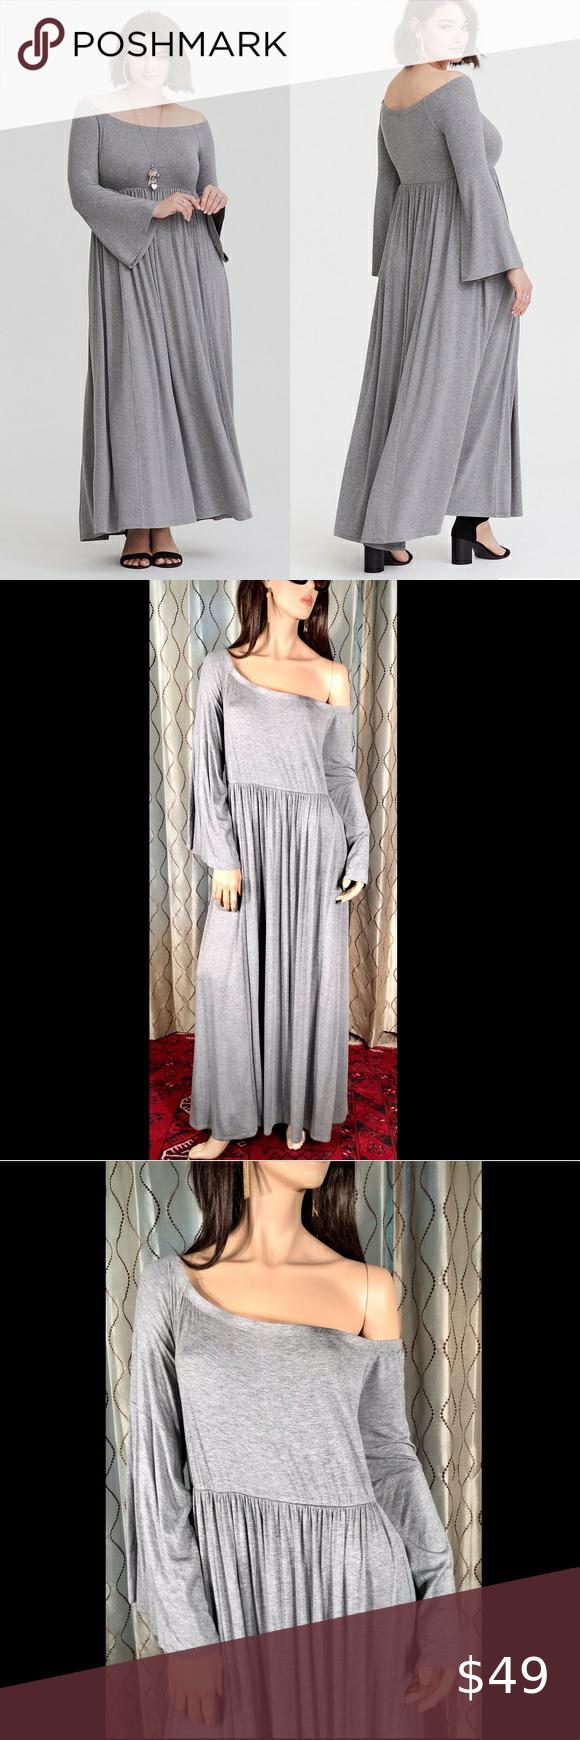 Torrid Gray Jersey Knit Off Shoulder Maxi Dress 4x Shoulder Maxi Dress Maxi Dress Dresses [ 1740 x 580 Pixel ]